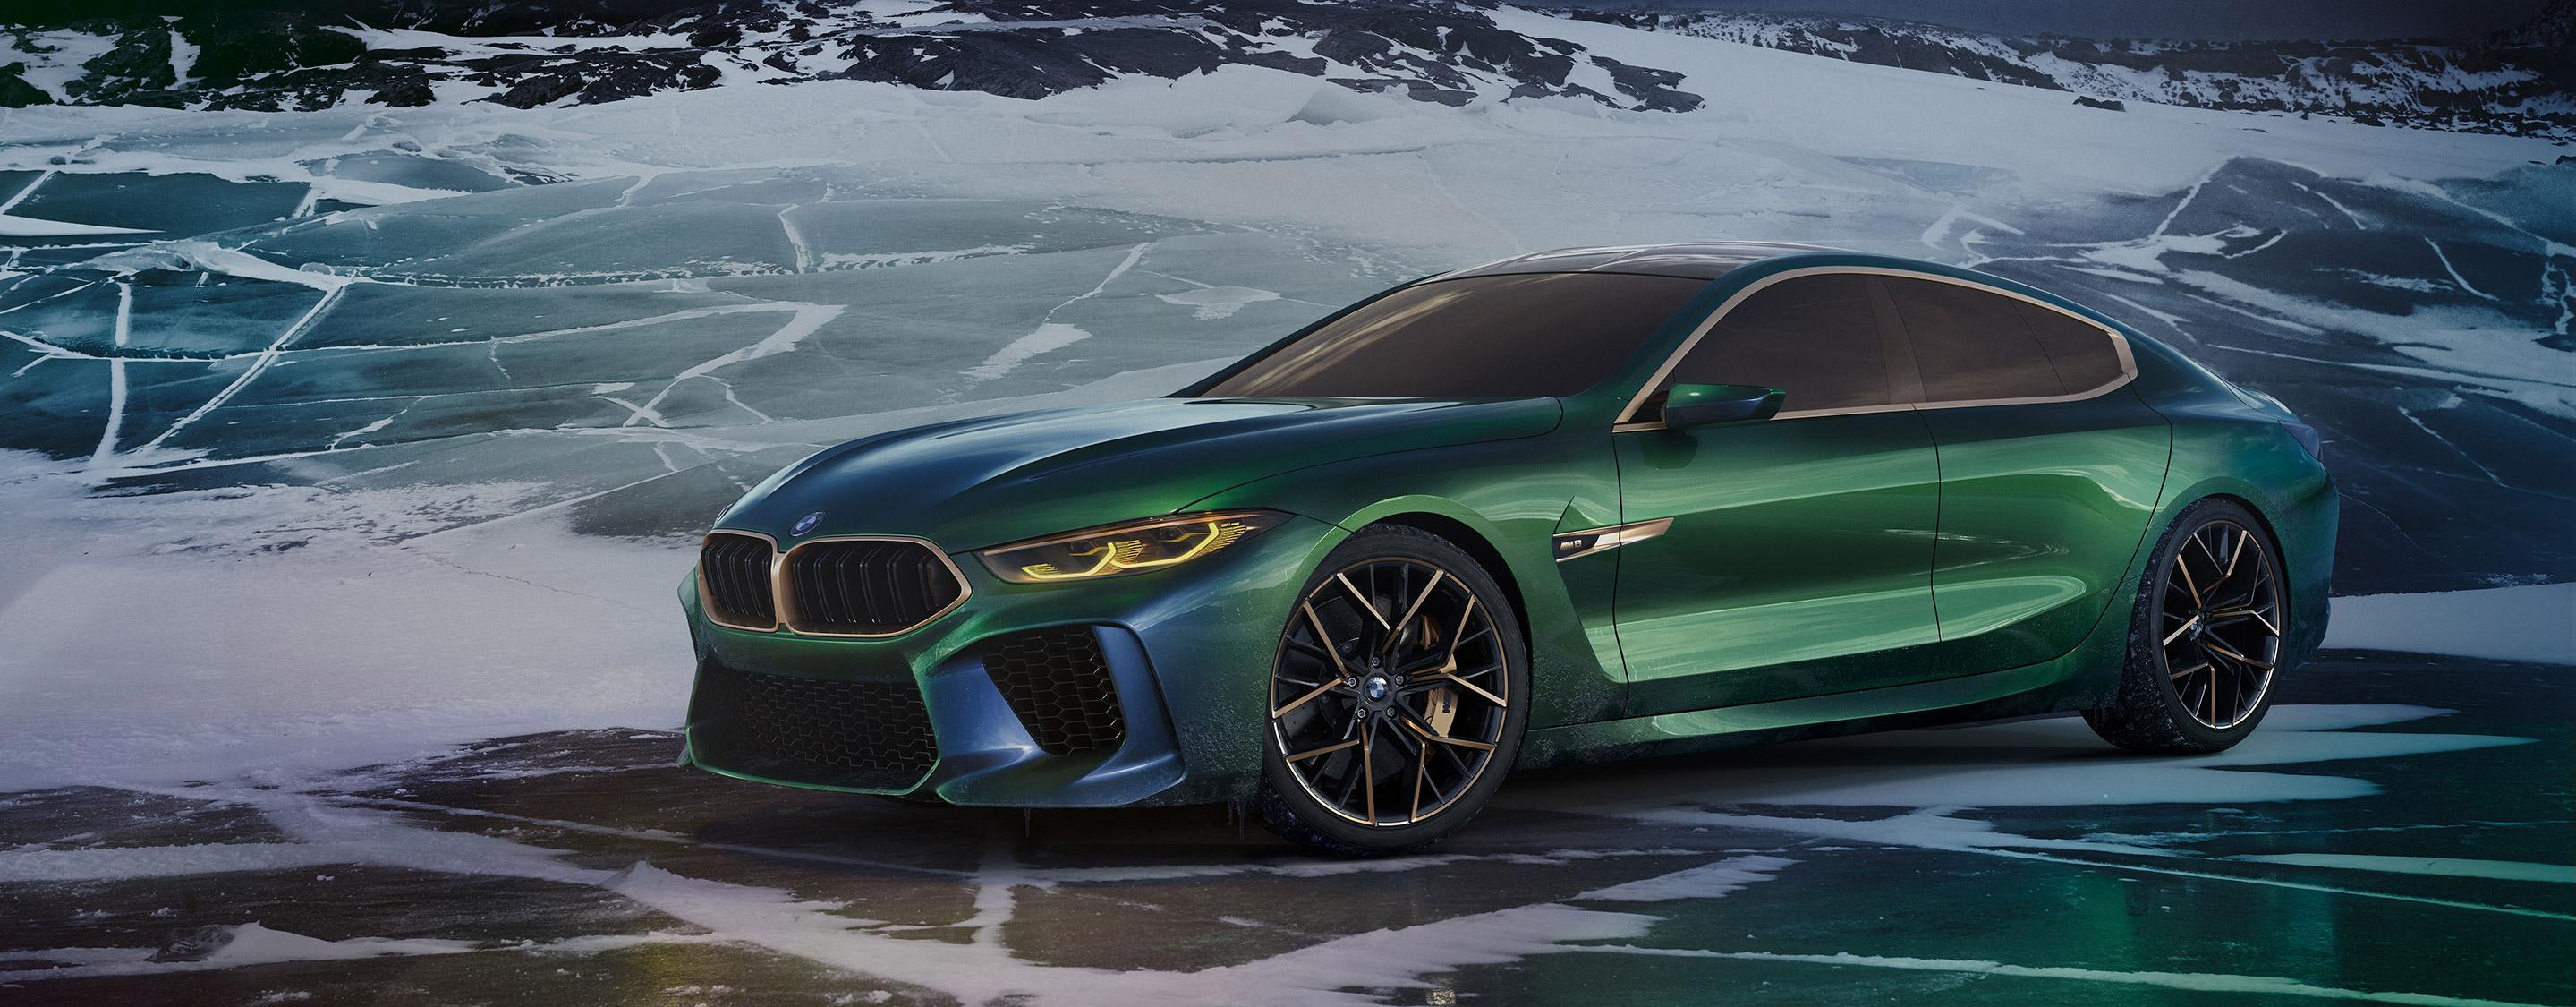 TrackWorthy - BMW Concept M8 Gran Coupe (1)